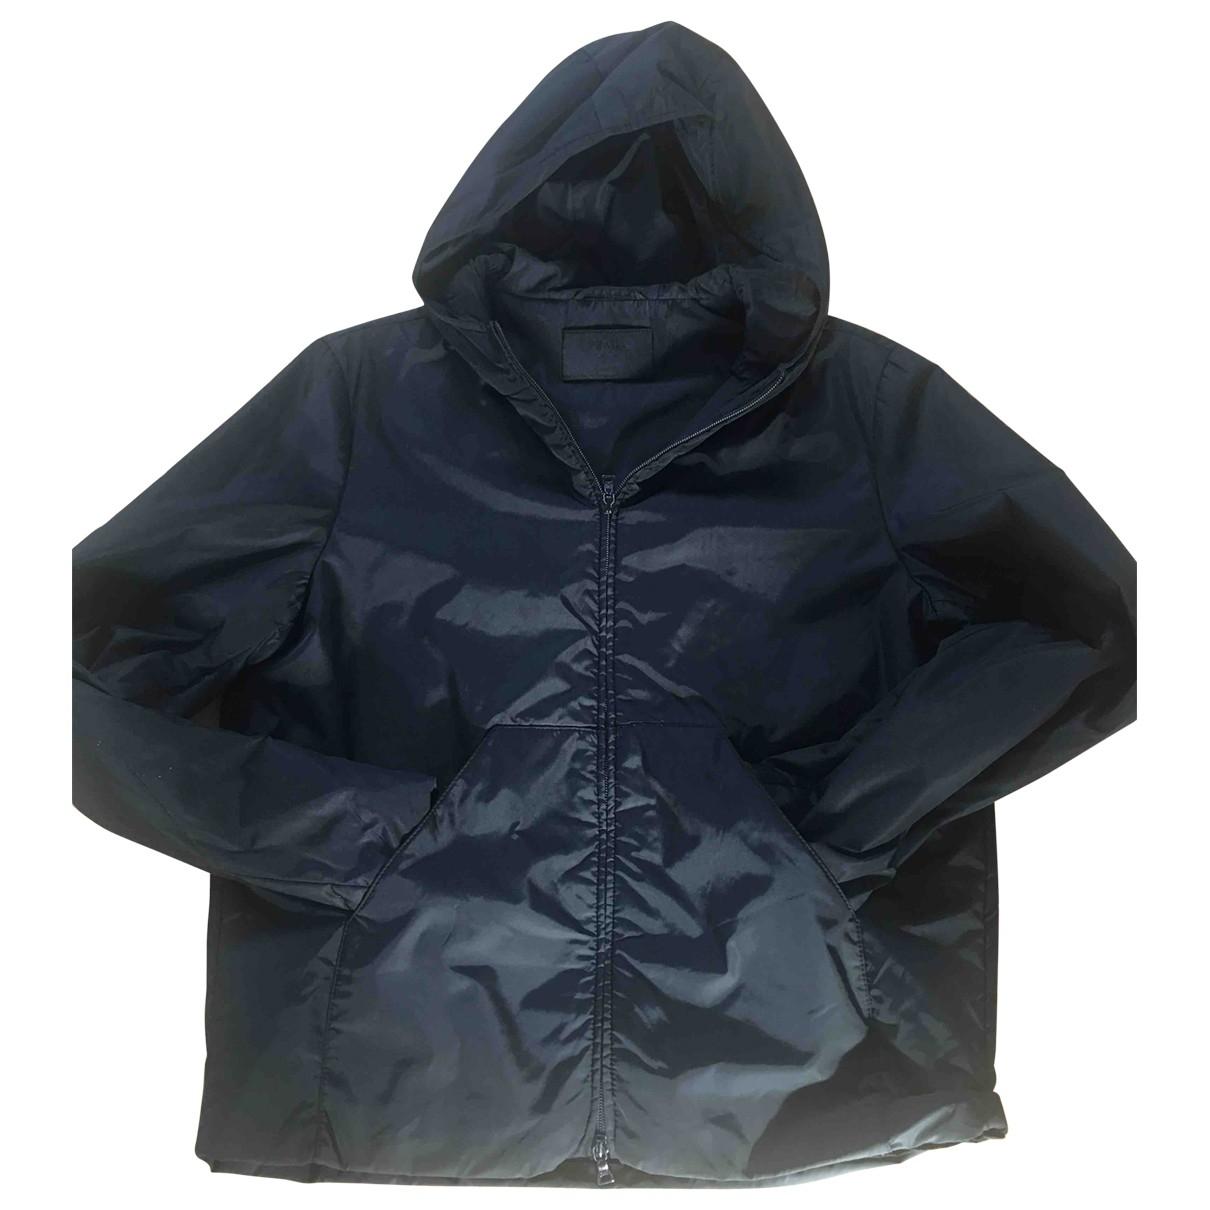 Prada \N Black Leather jacket for Women 44 IT